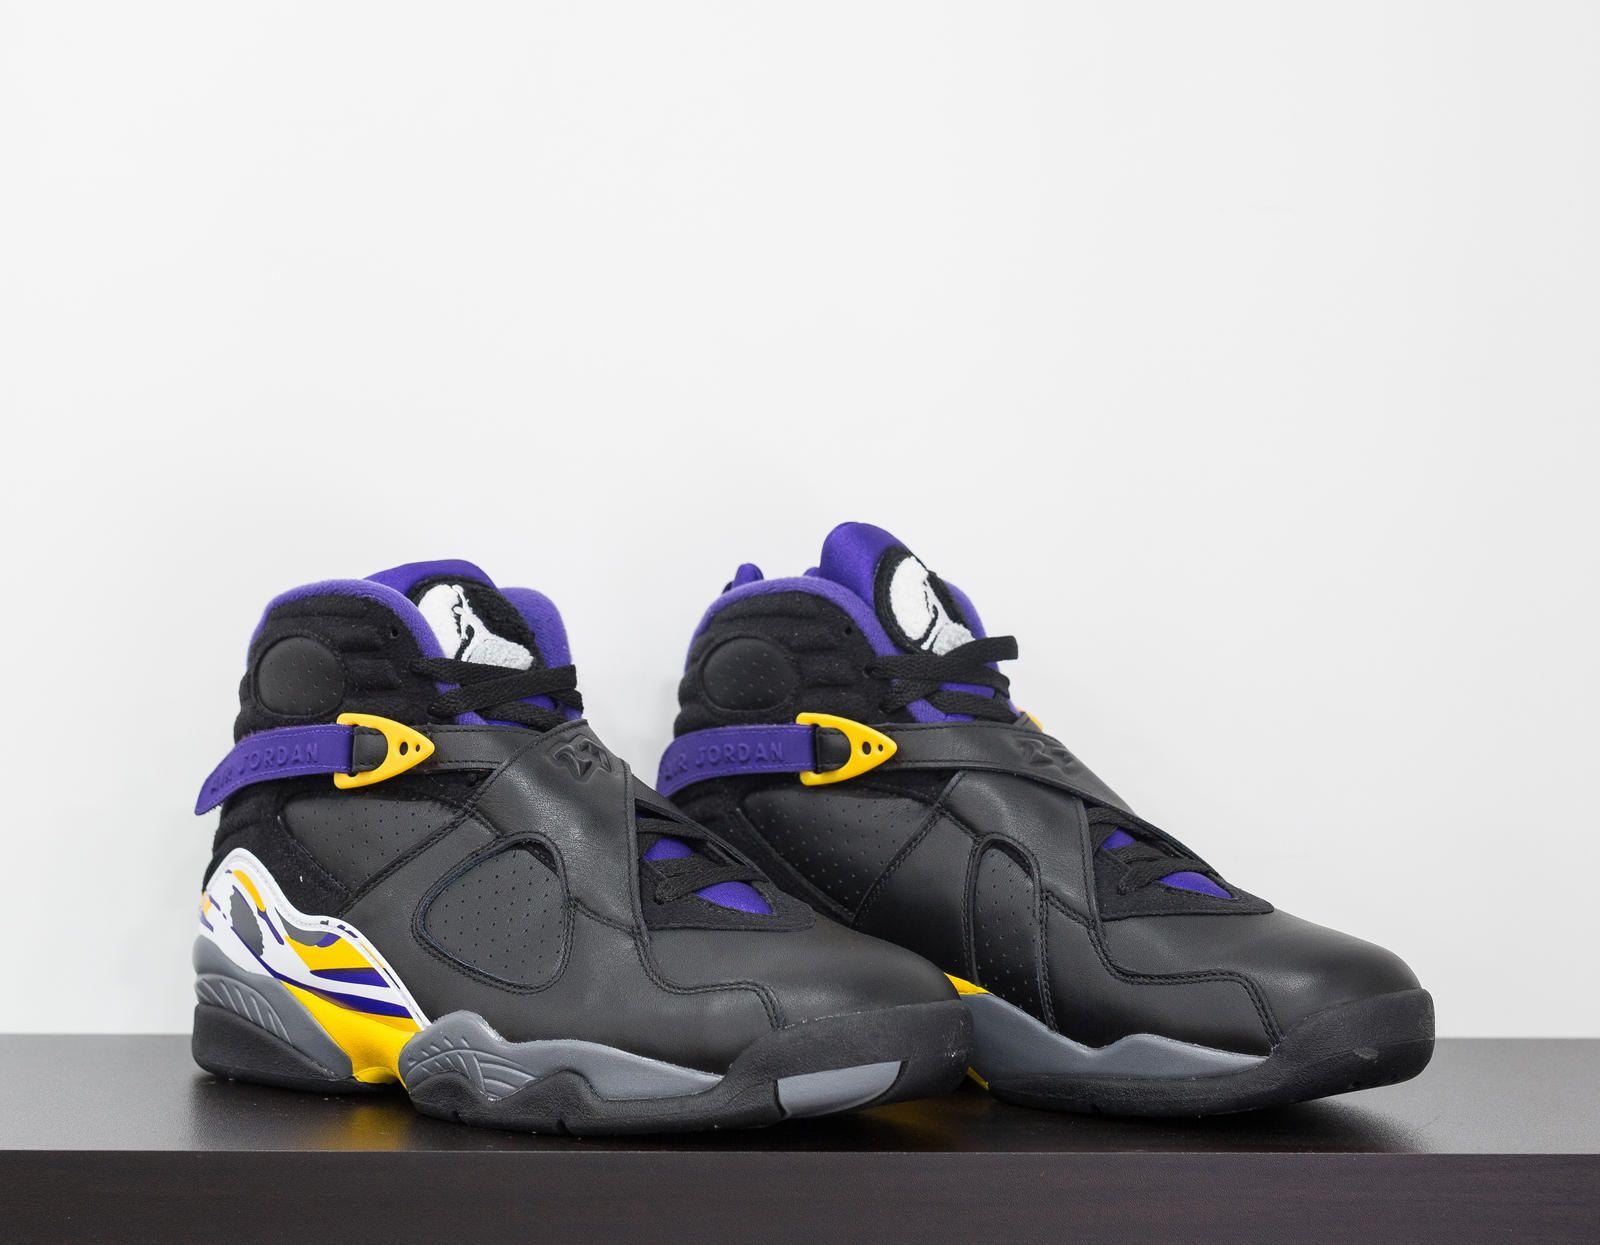 premium selection 9baa9 67a36 Nike News - Jordan Brand Pays Tribute to Kobe Bryant